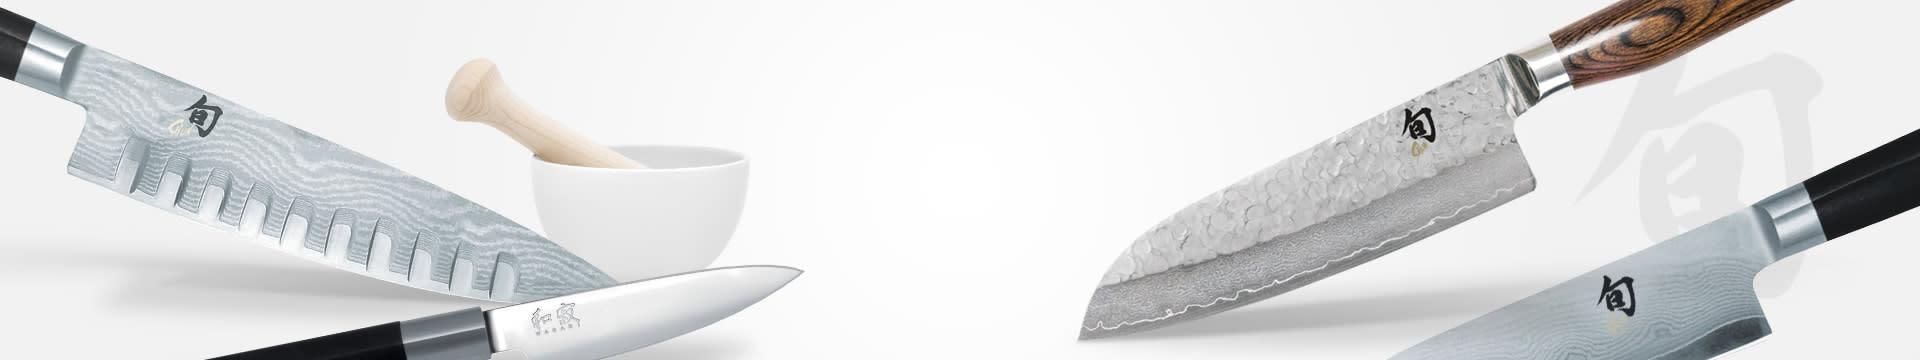 Banner image of KAI Knives